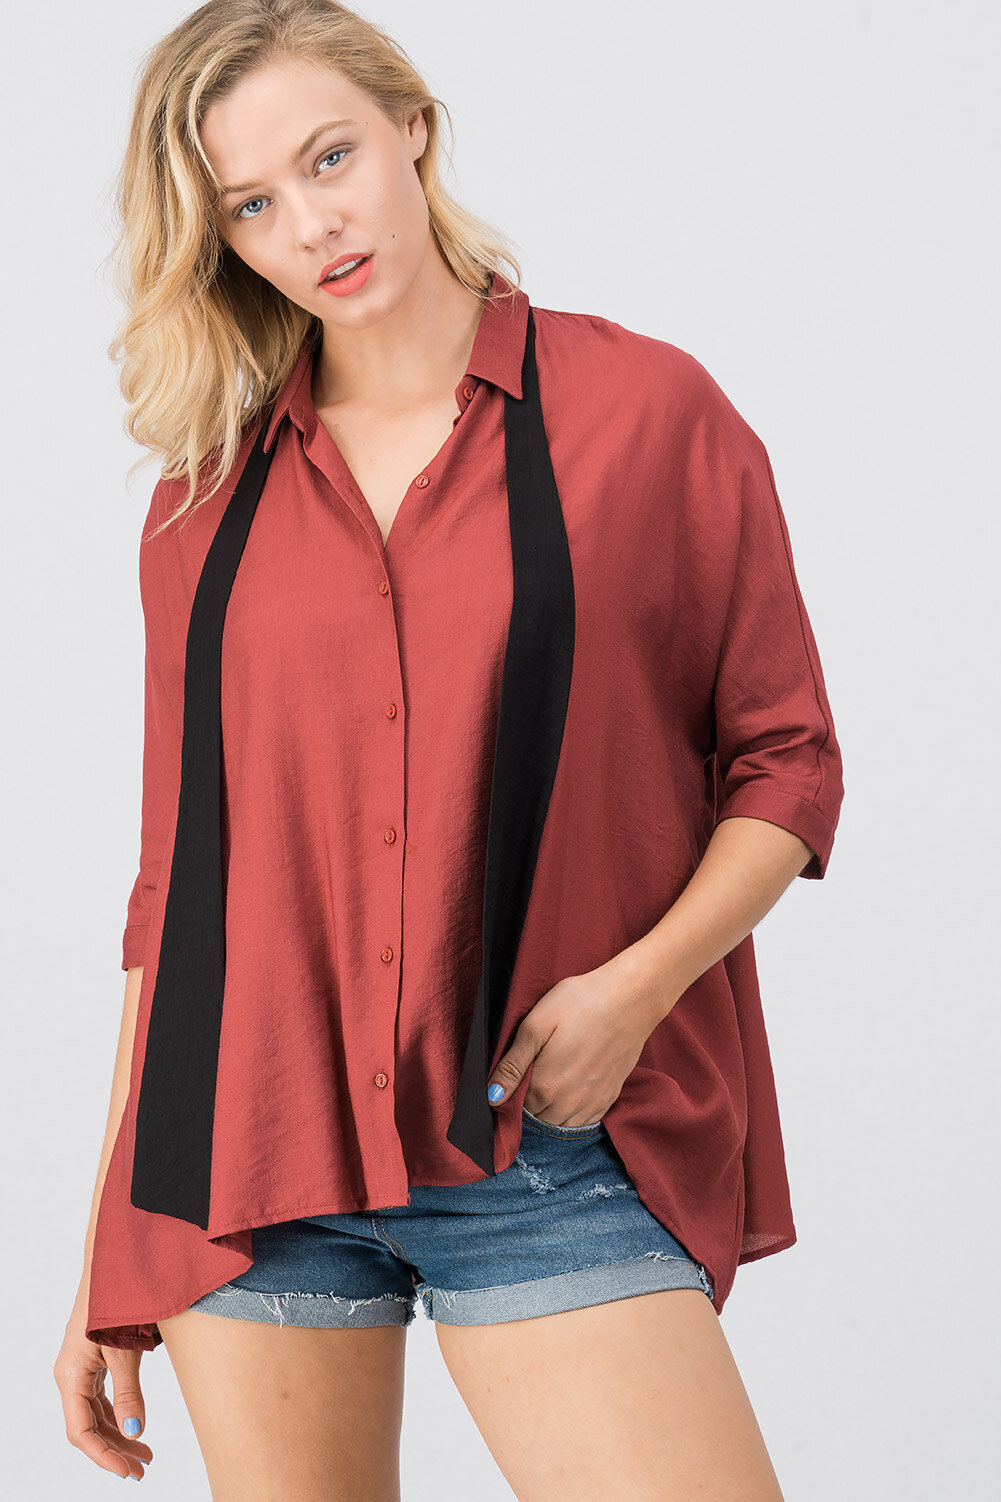 d45a9d46c085a7 Urban Tie Oversized Dolman Sleeve Shirt